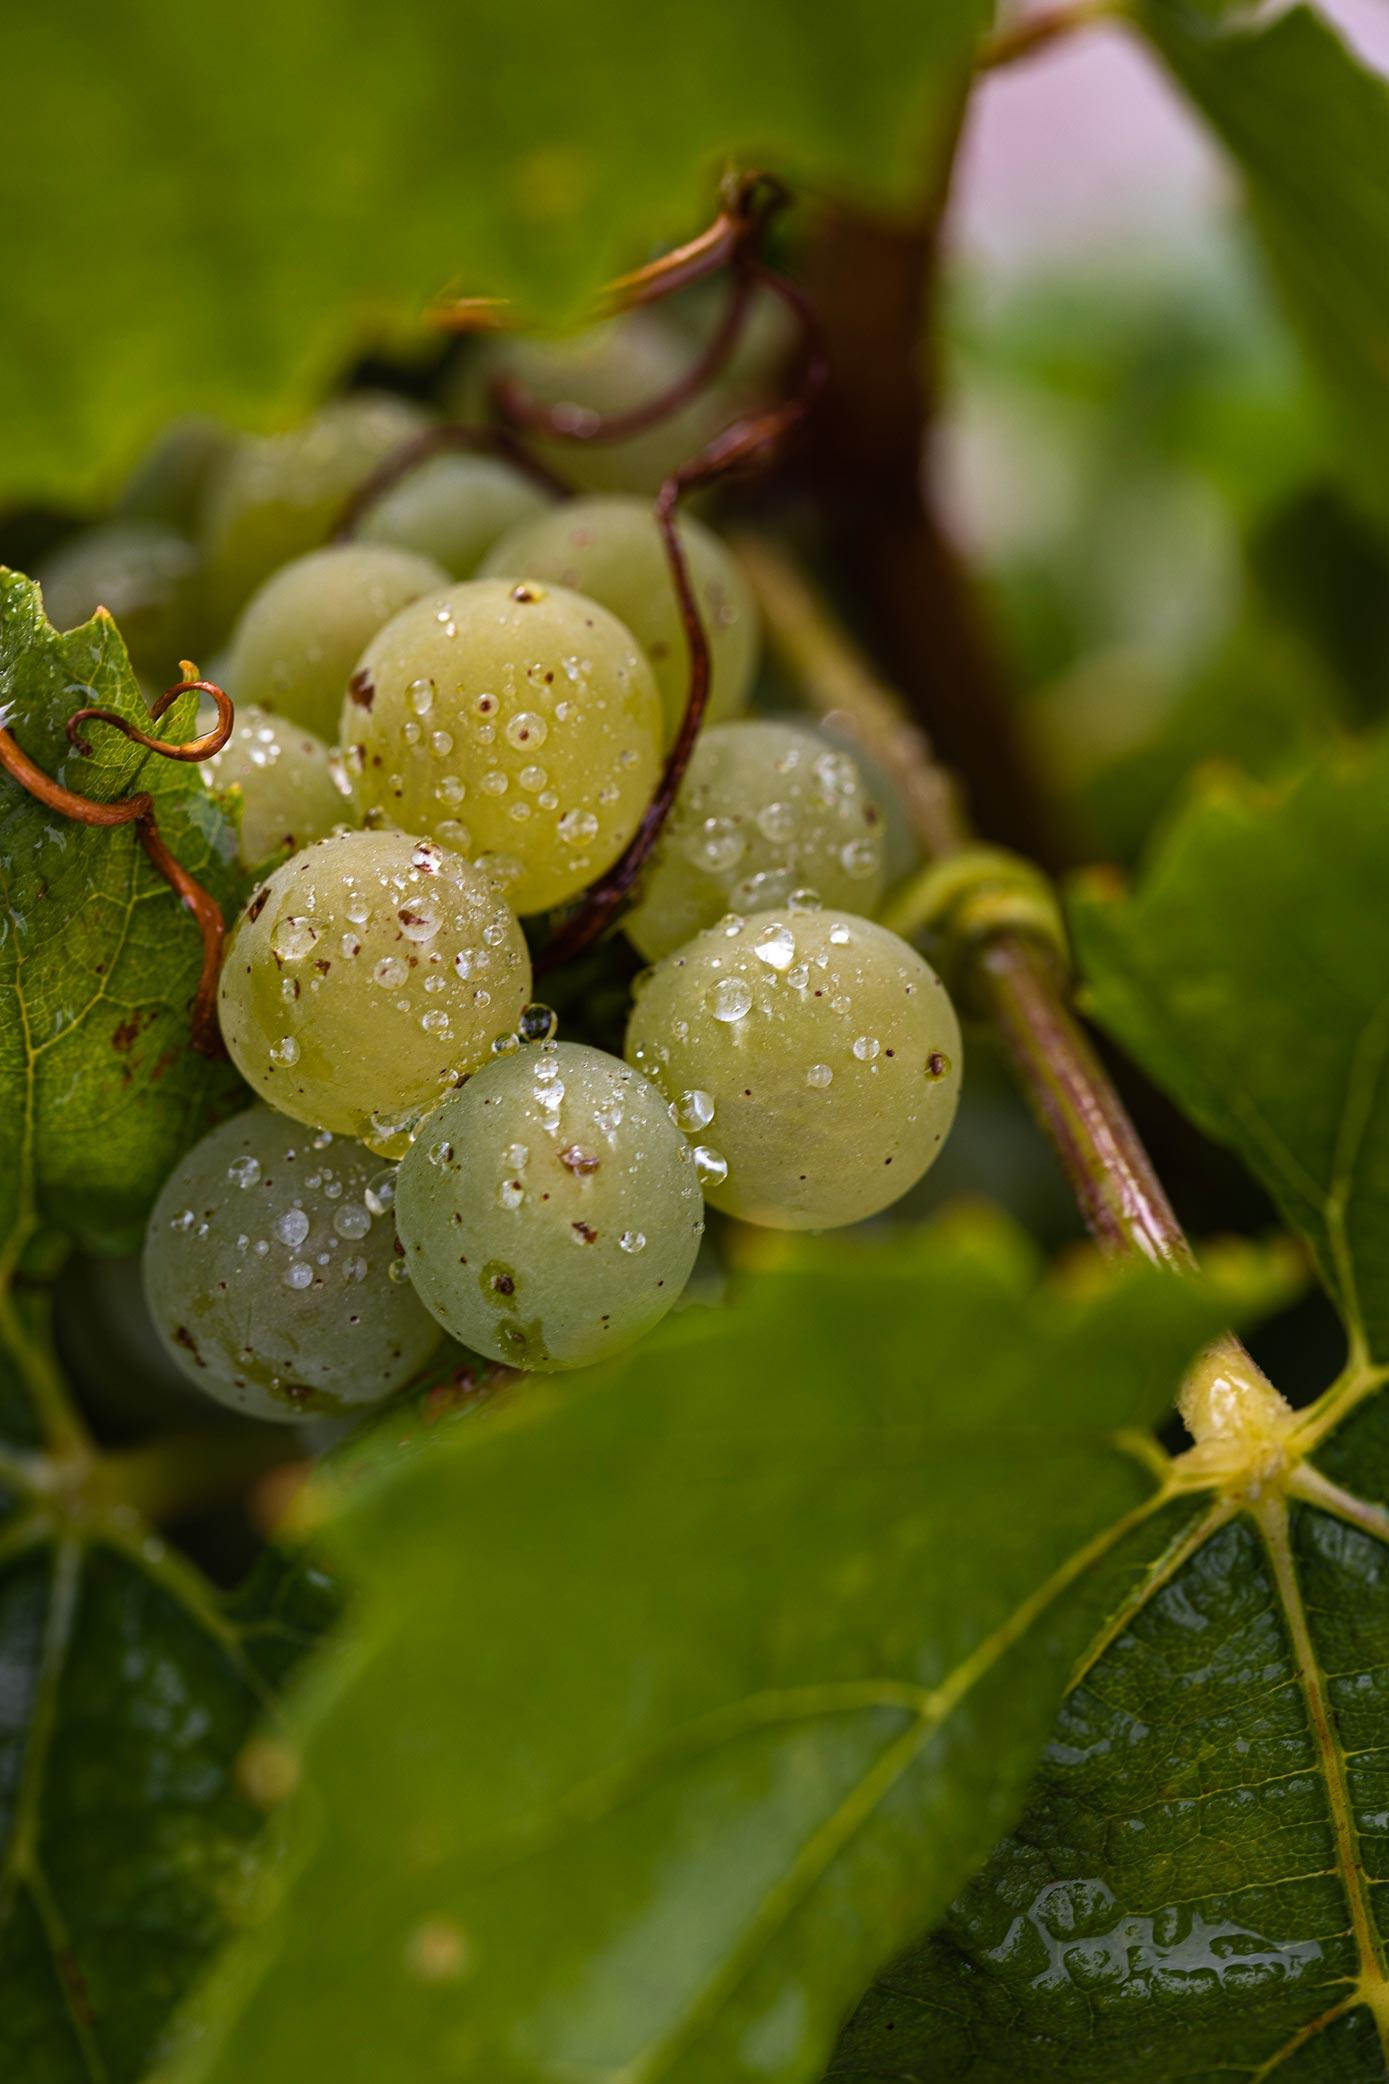 Grappe de raisins Chardonnay - Reportage photo Champagne Antoine Chevalier - Agence Discovery